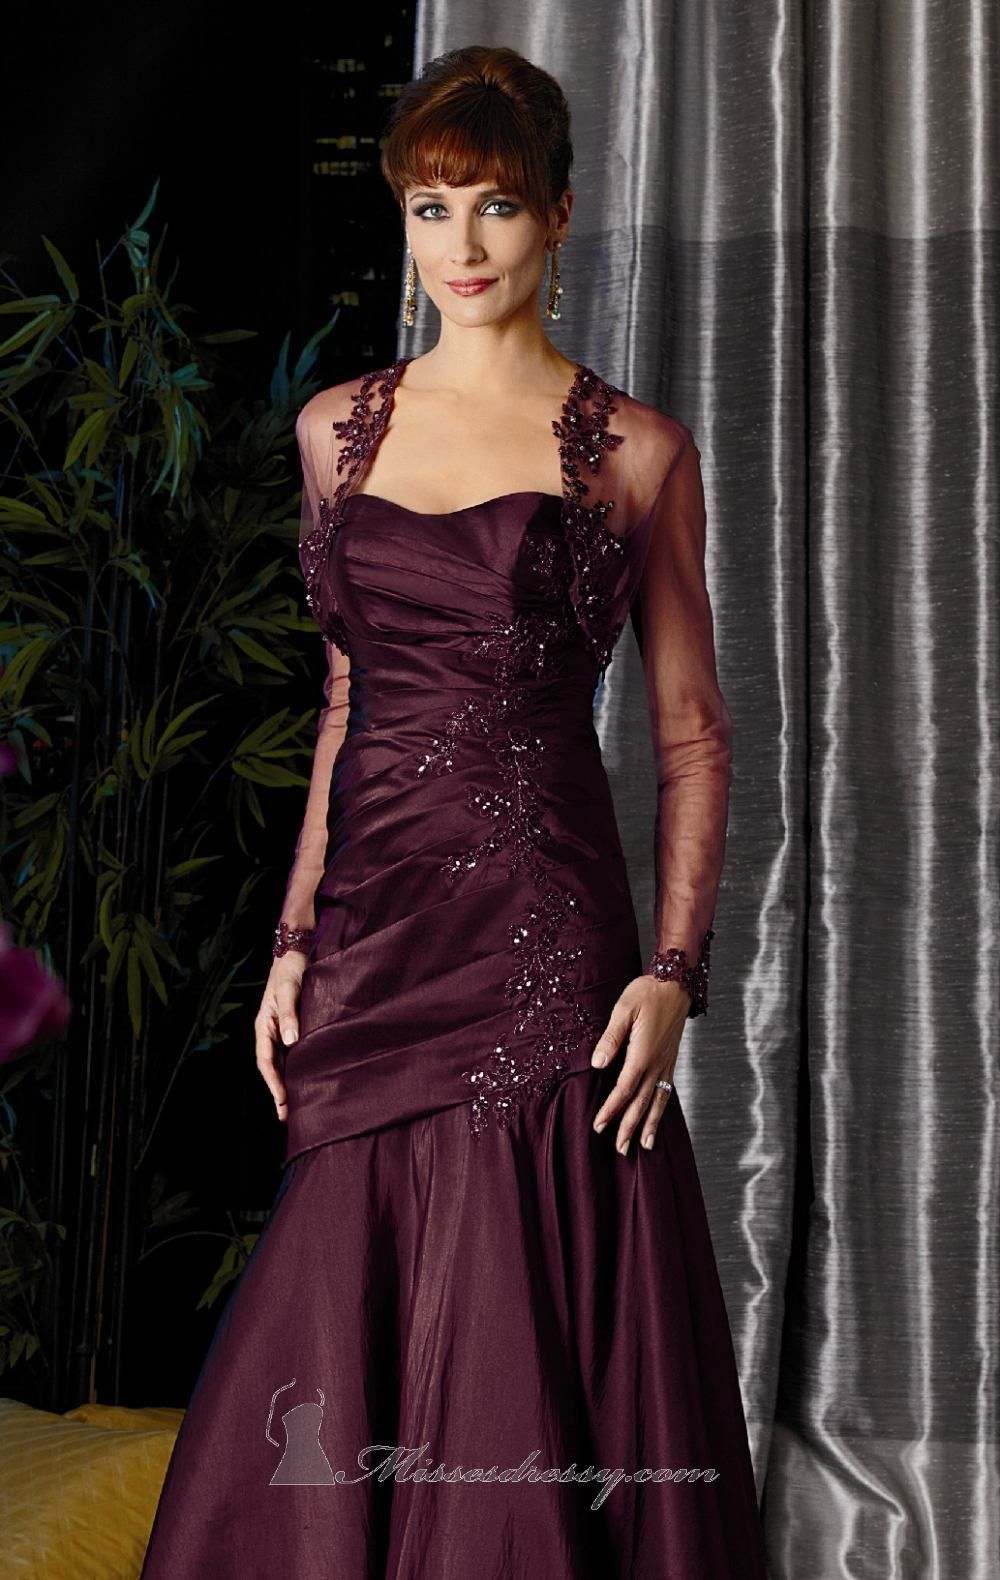 http://fauxtogo.com/jordan-7003p-dress-p-3176.html